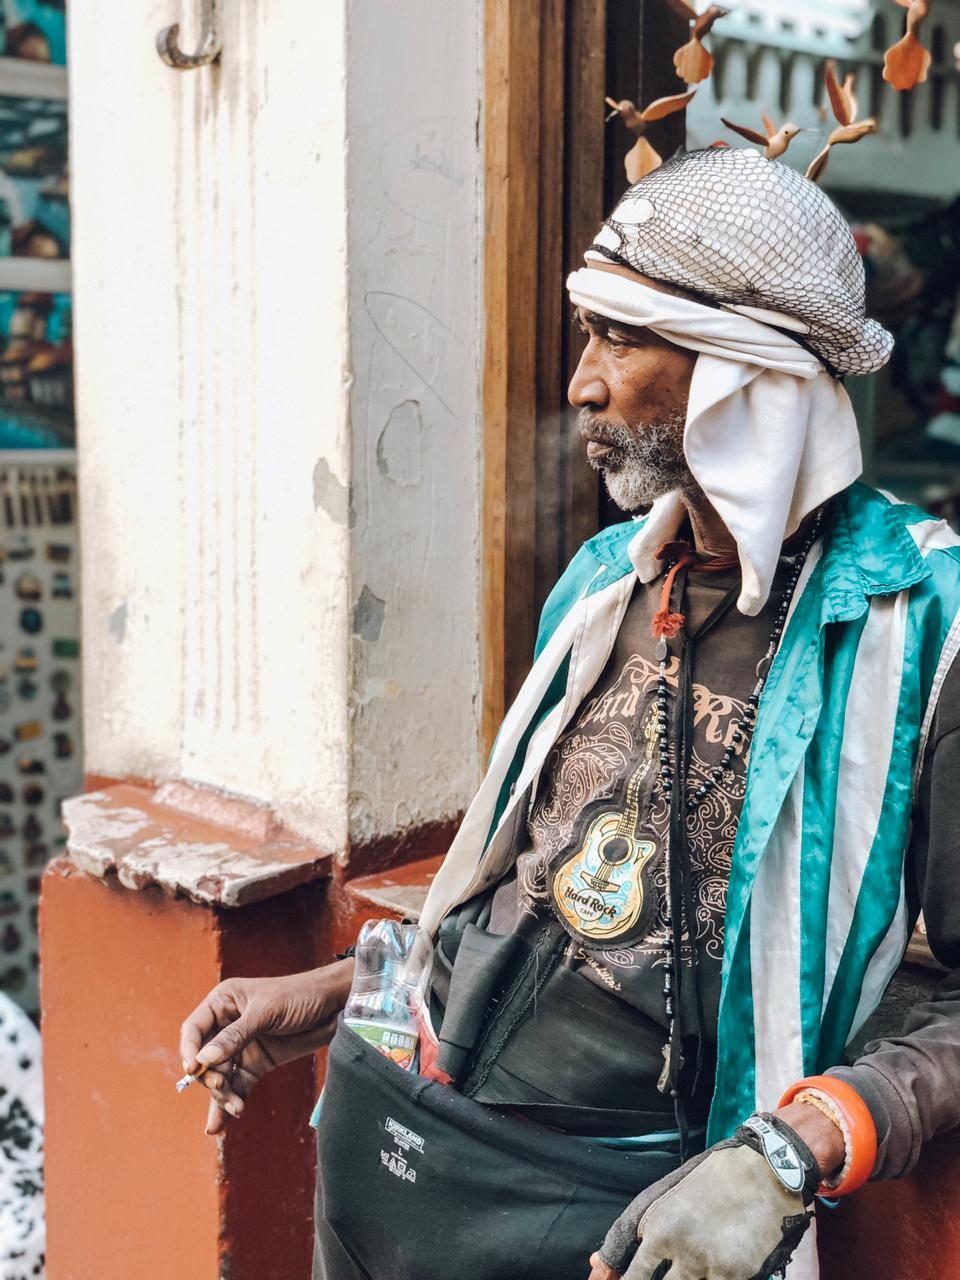 Cubano pelas ruas de Hava (Foto: Tati Sisti)